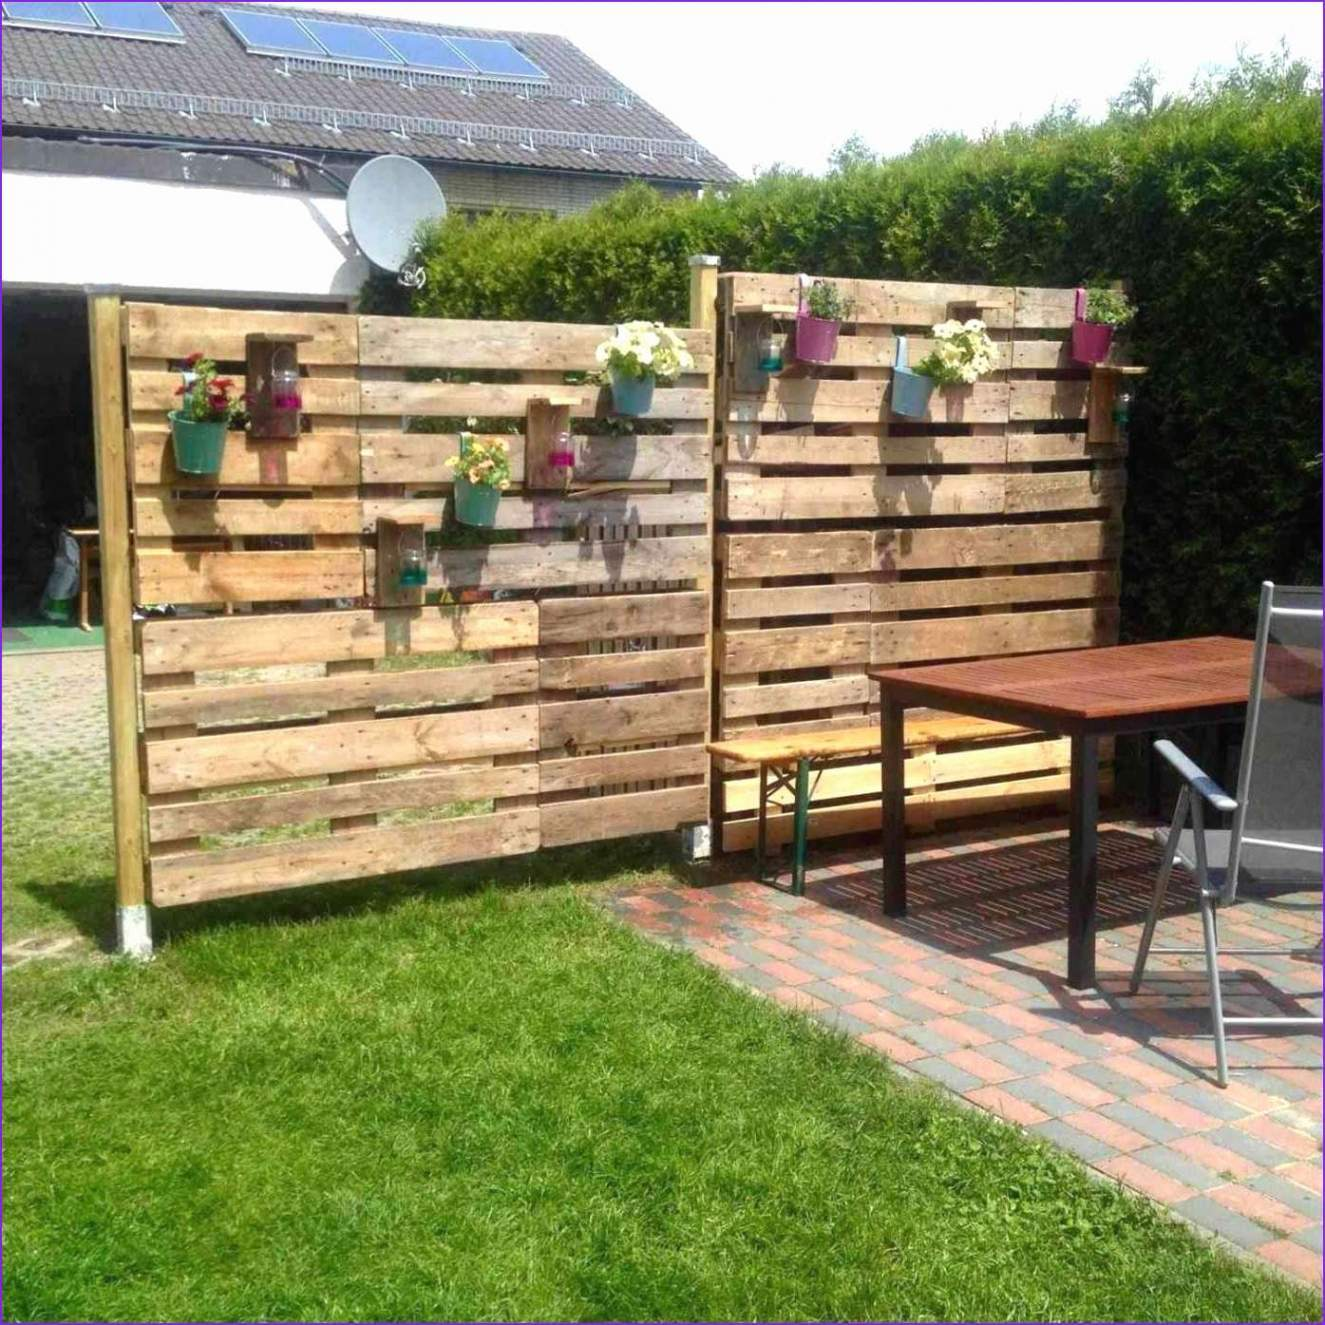 42 frisch idee fur garten stock pflanzen sichtschutz terrasse kubel pflanzen sichtschutz terrasse kubel